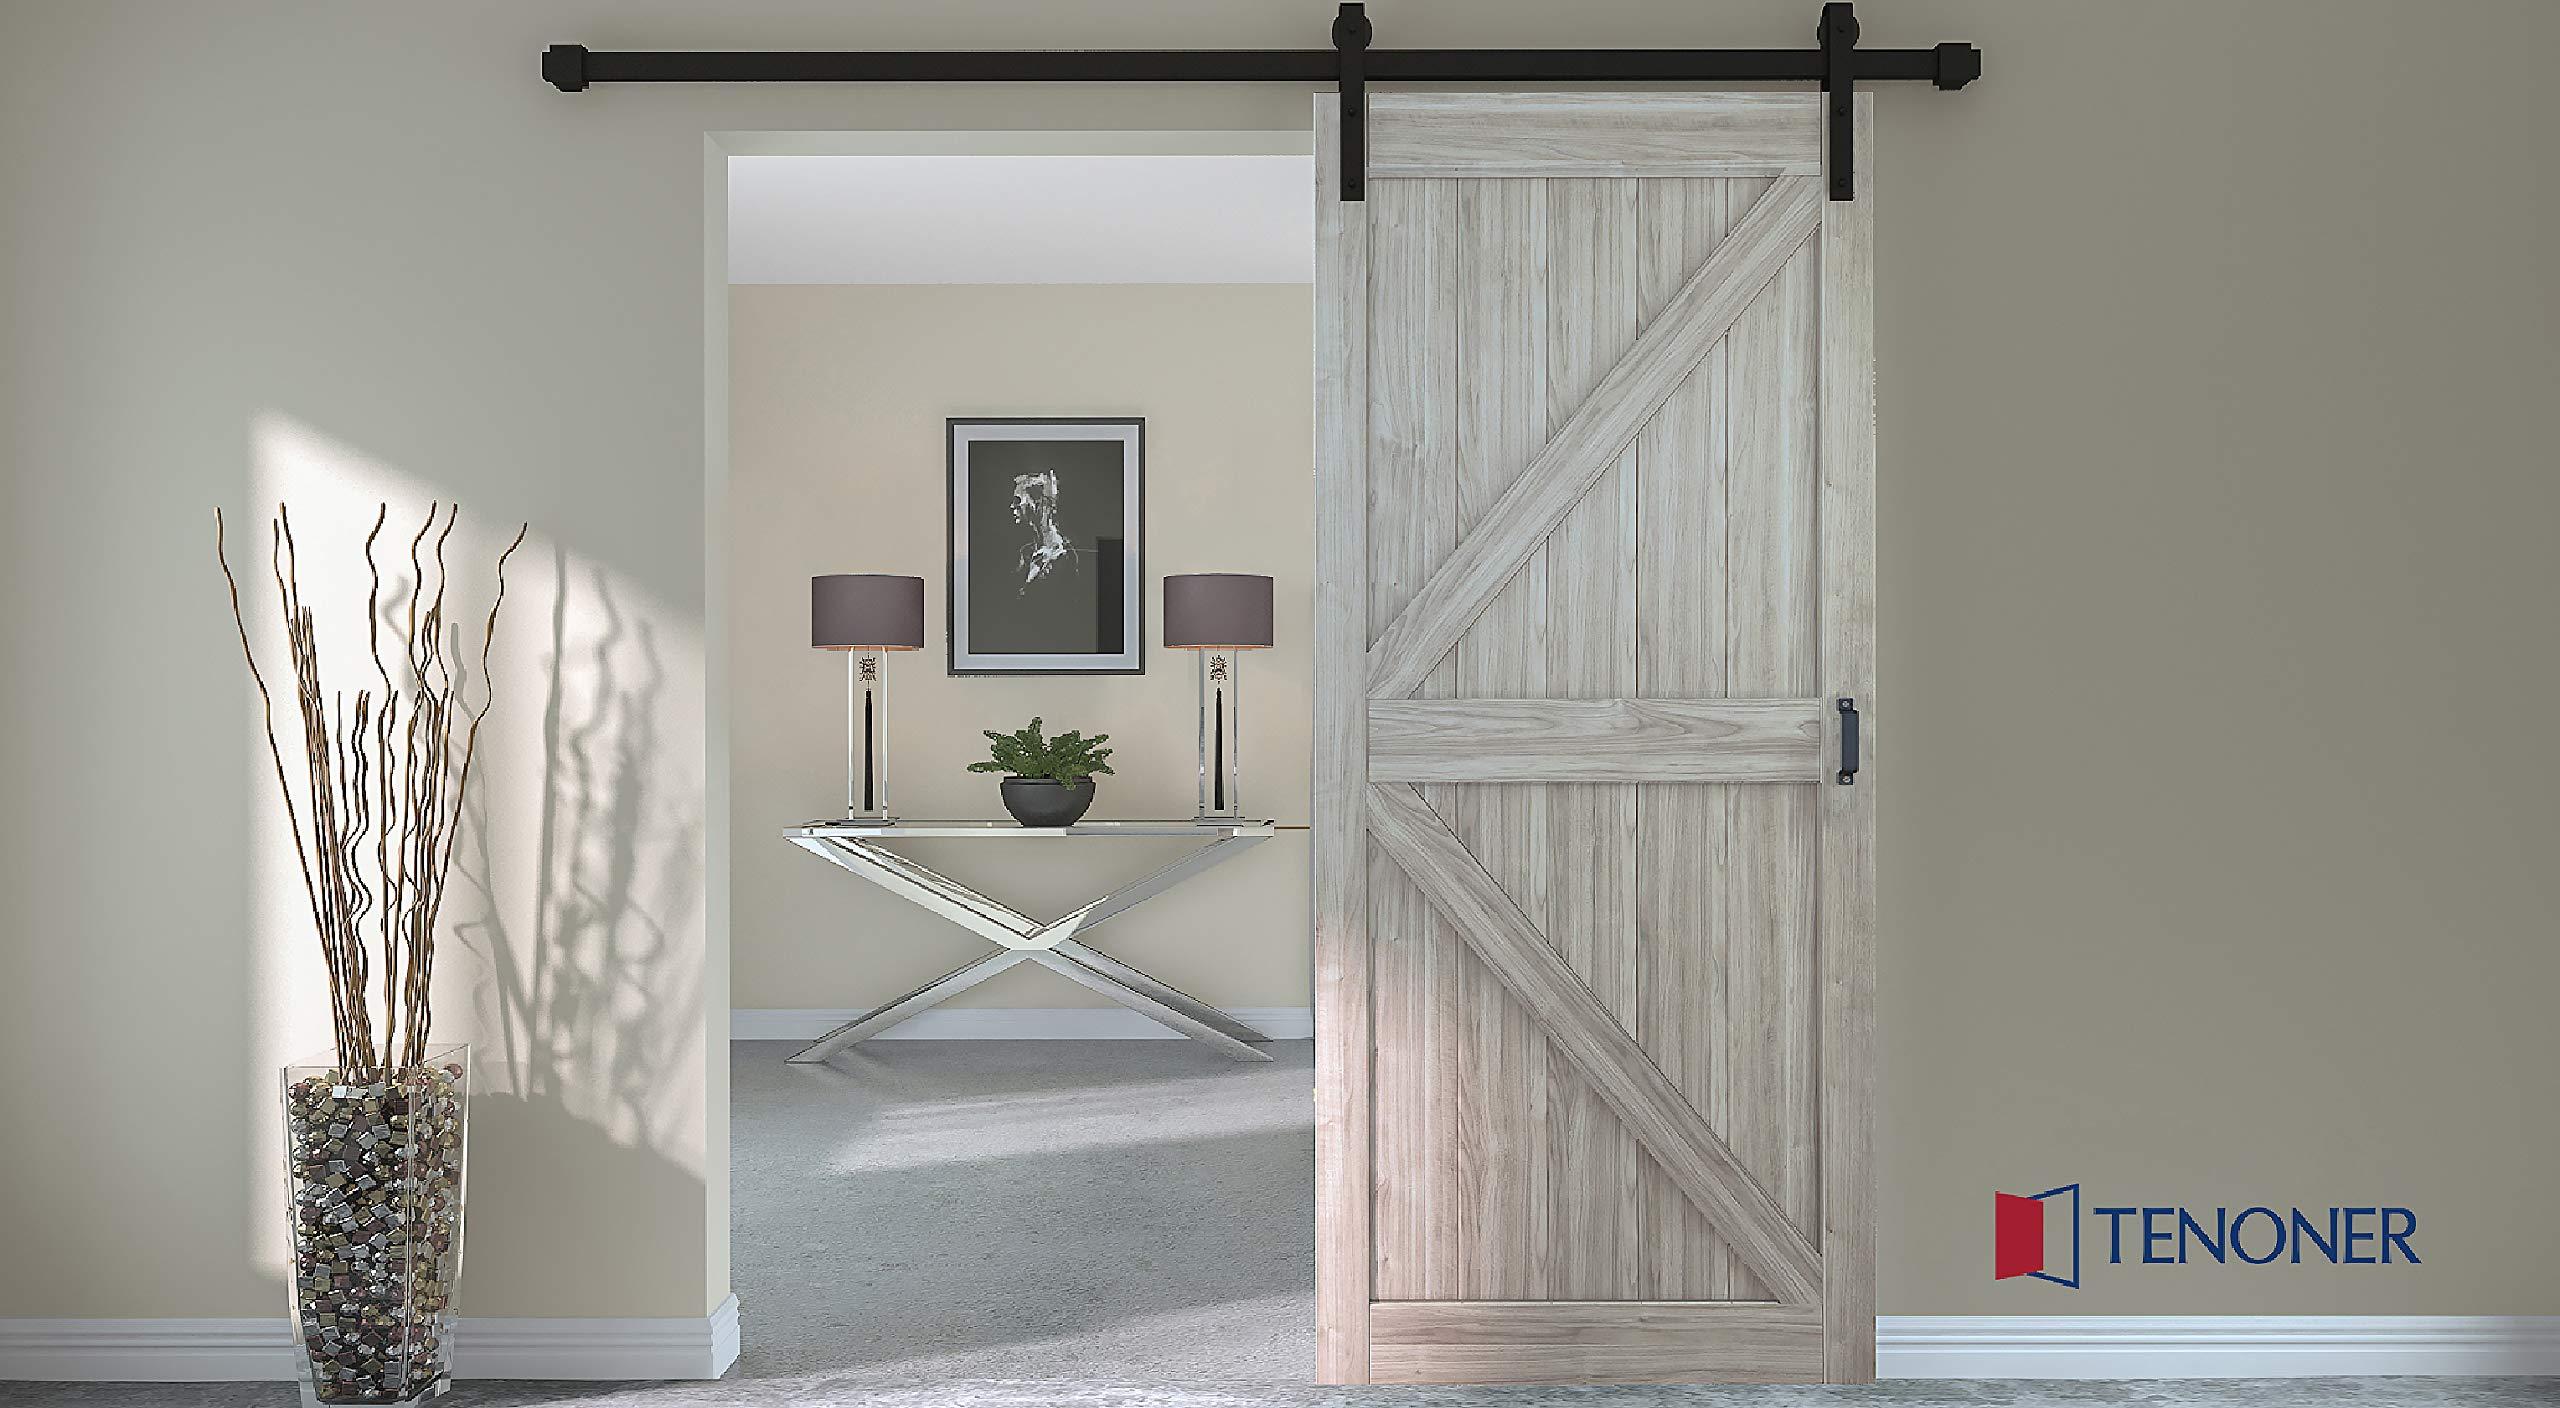 TENONER 36in x 84in Grey K-Frame Sliding Barn Door, 6.6ft Barn Door Hardware Kit & Handle Included by TENONER (Image #2)